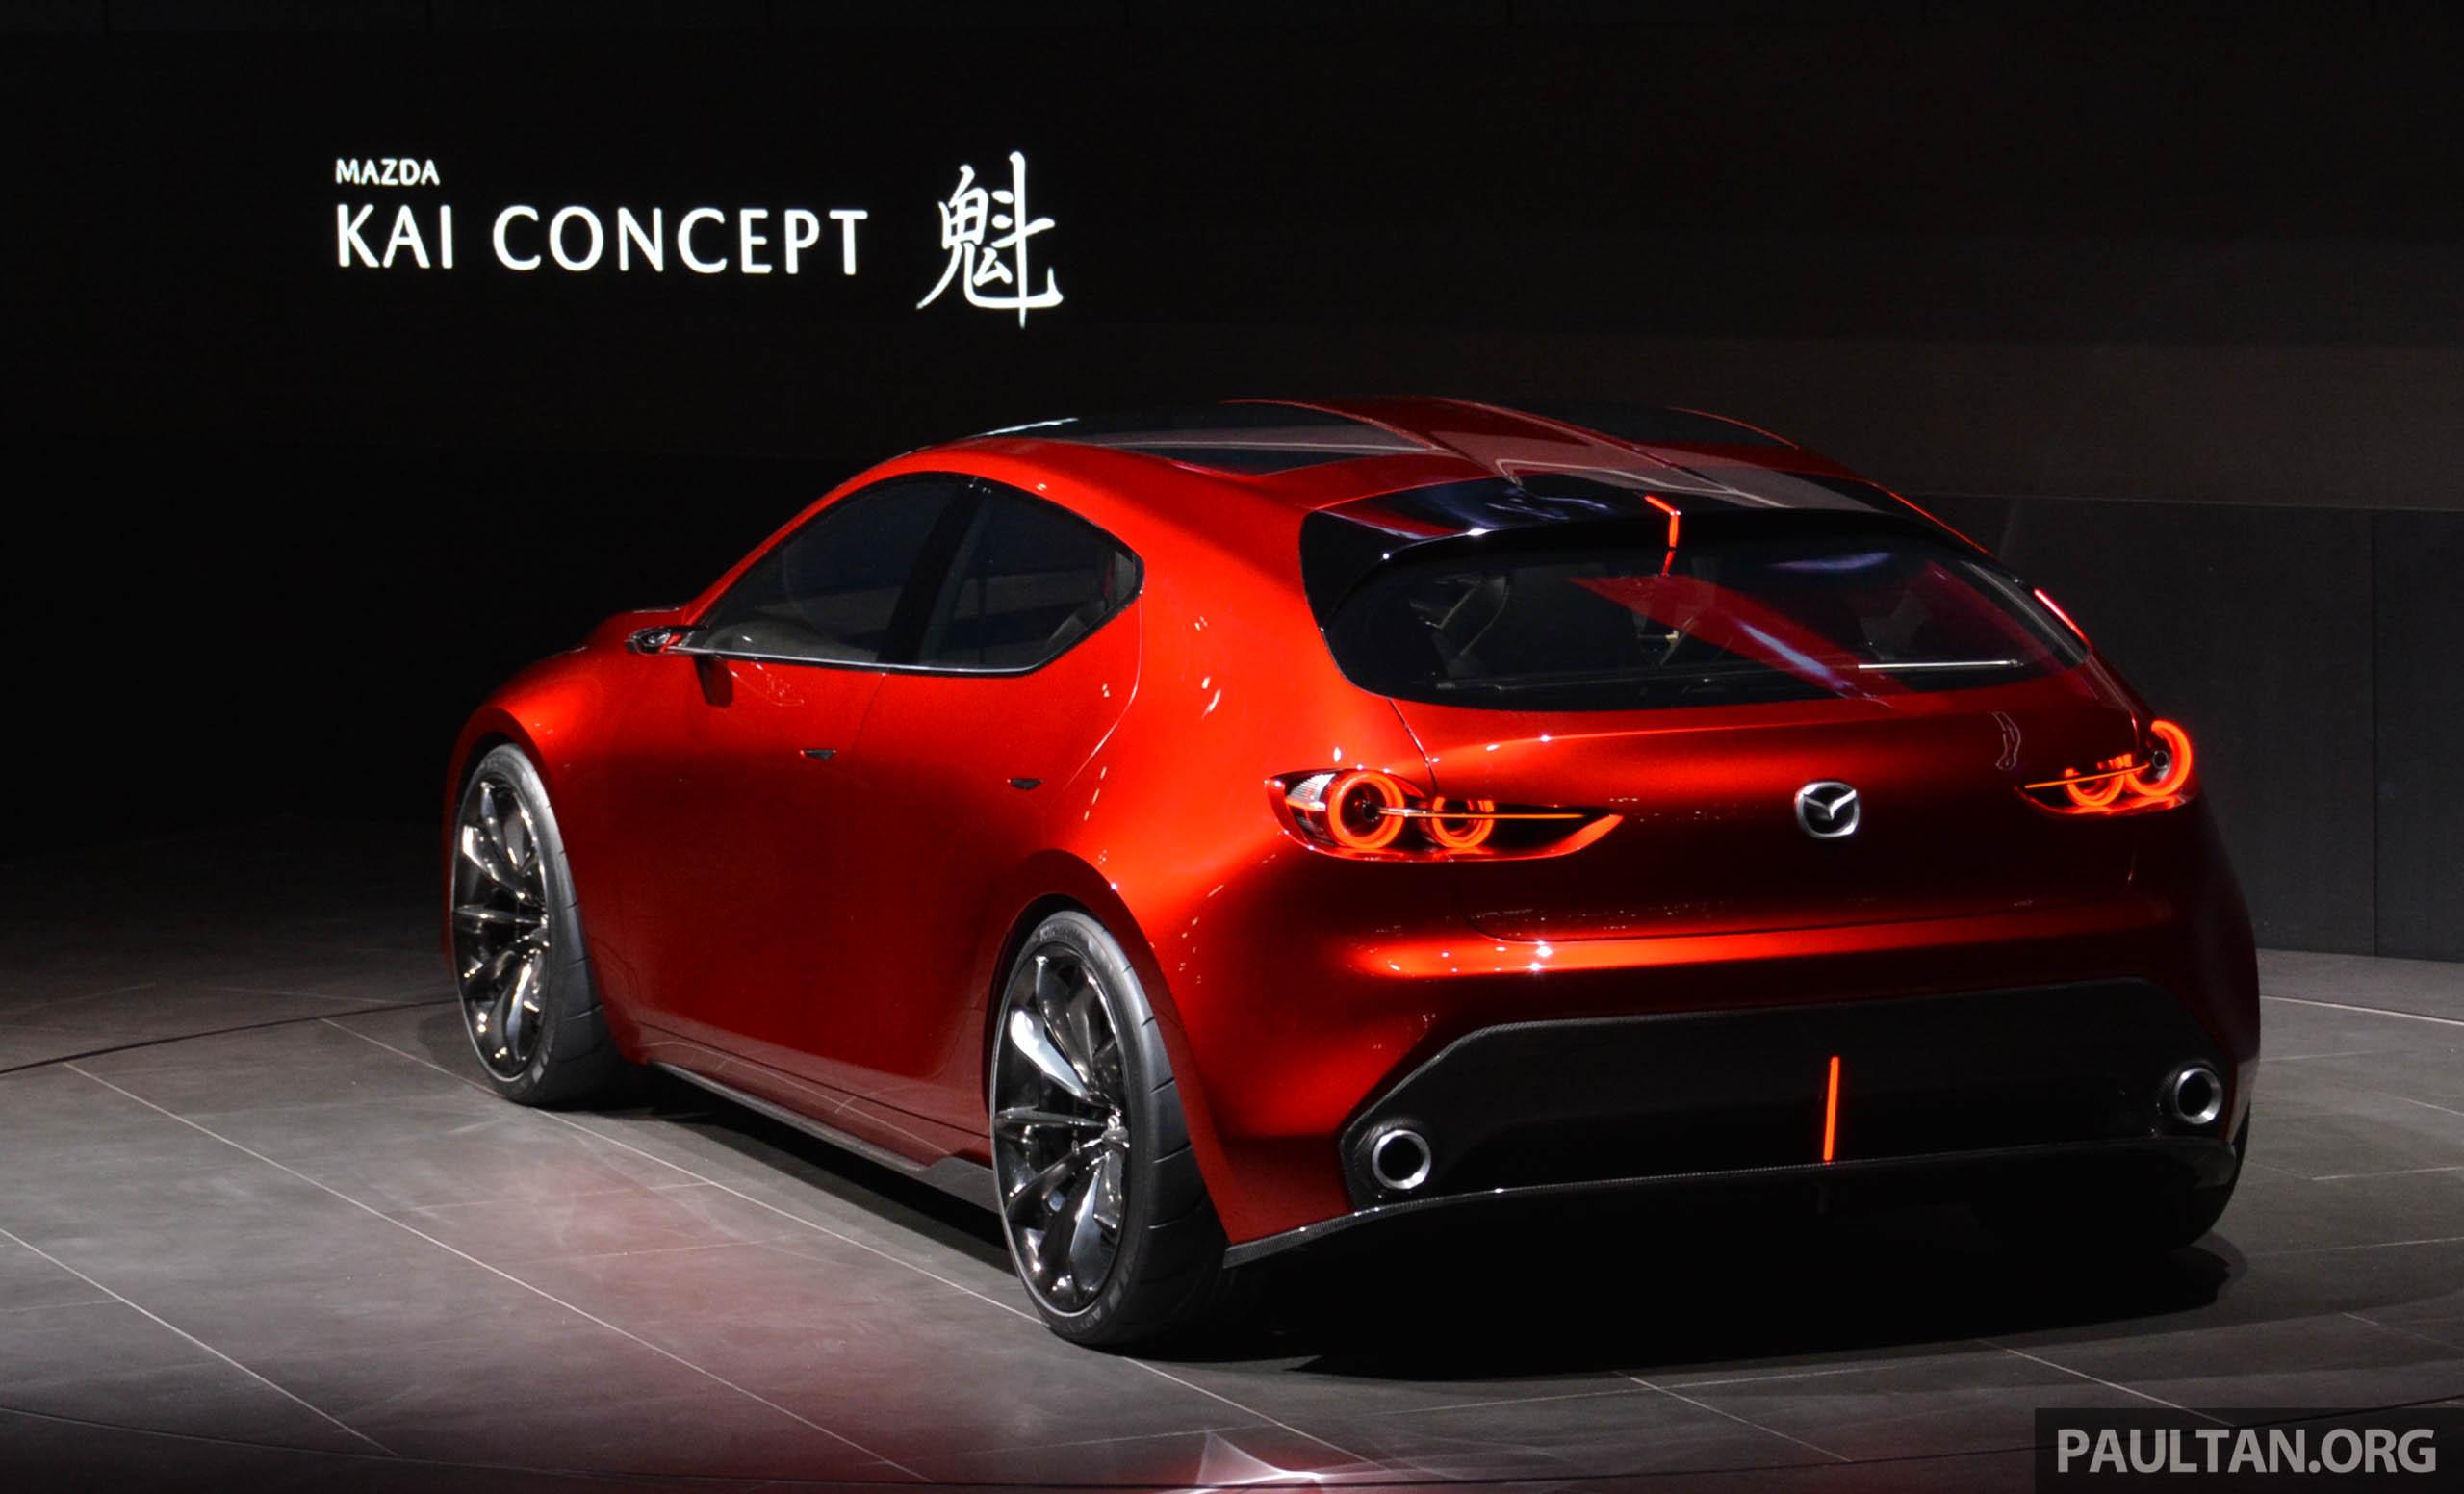 Mazda Kai Concept Update Upcoming Cars 2020